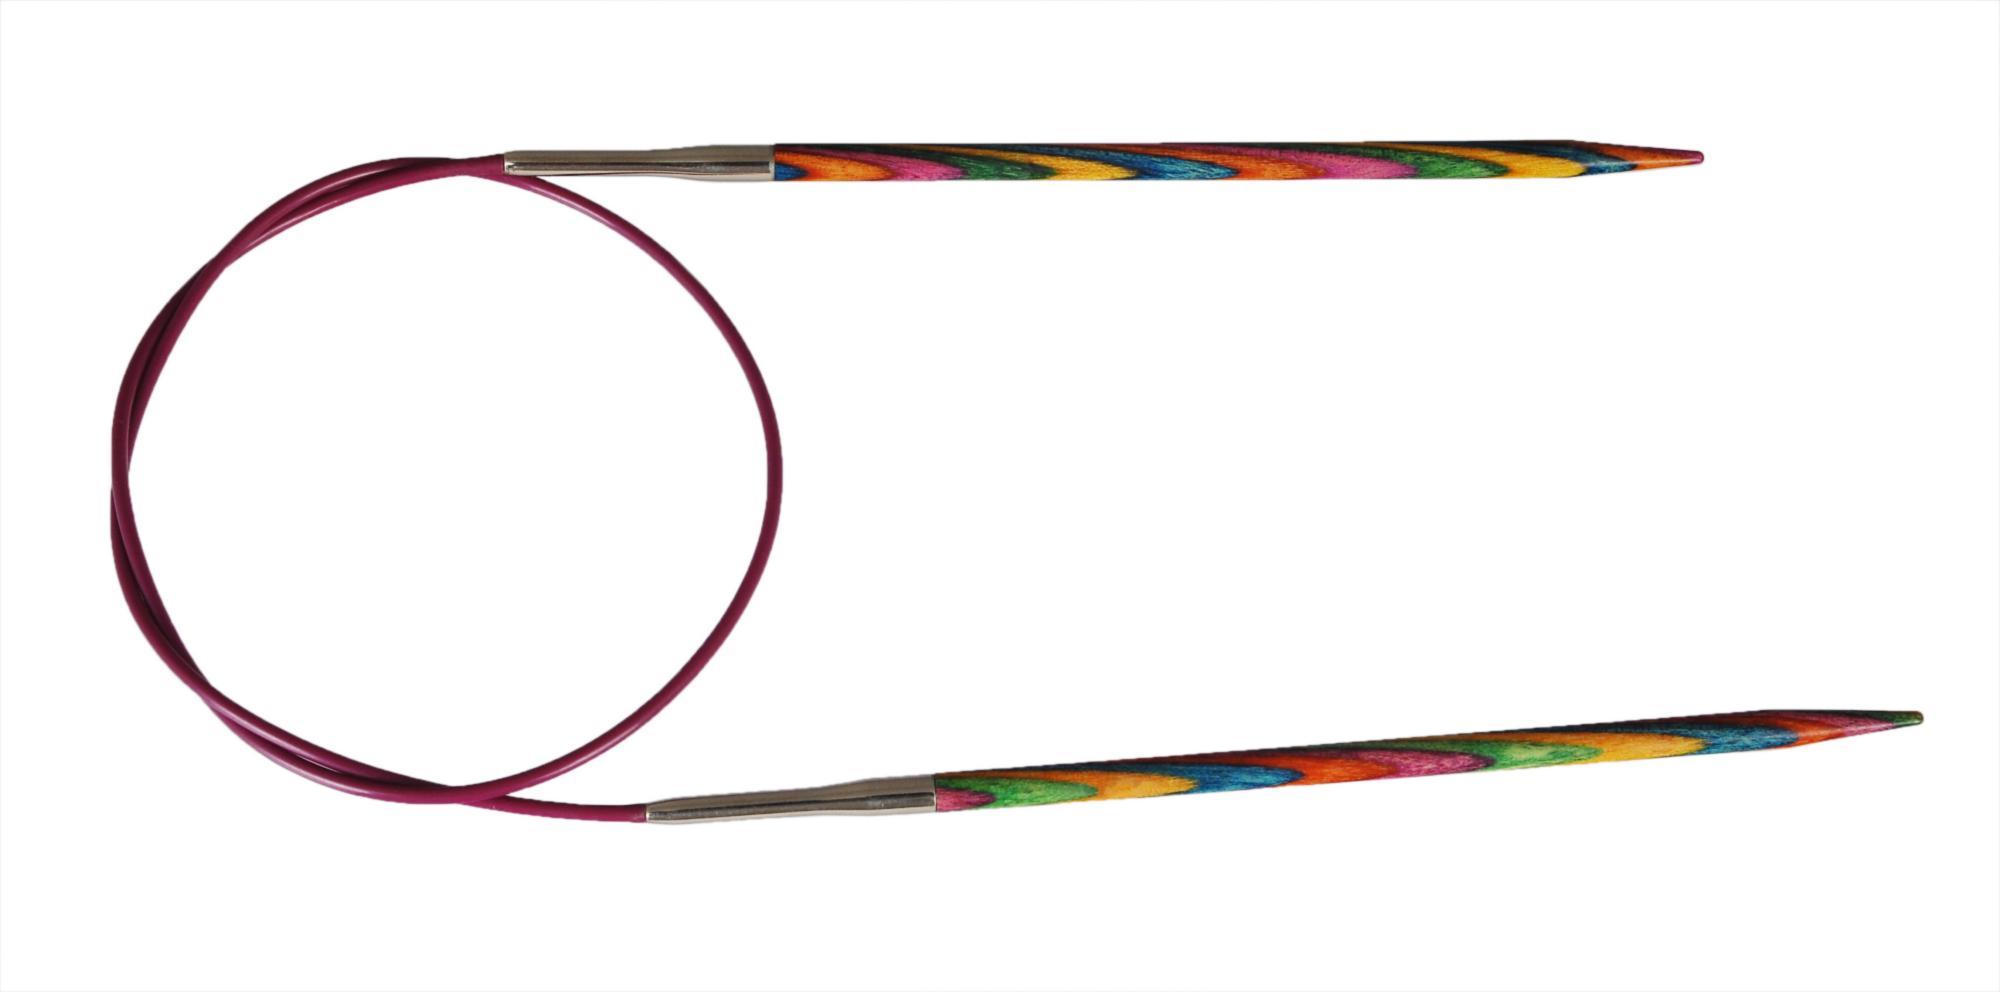 Спицы круговые 80 см Symfonie Wood KnitPro, 20335, 3.00 мм